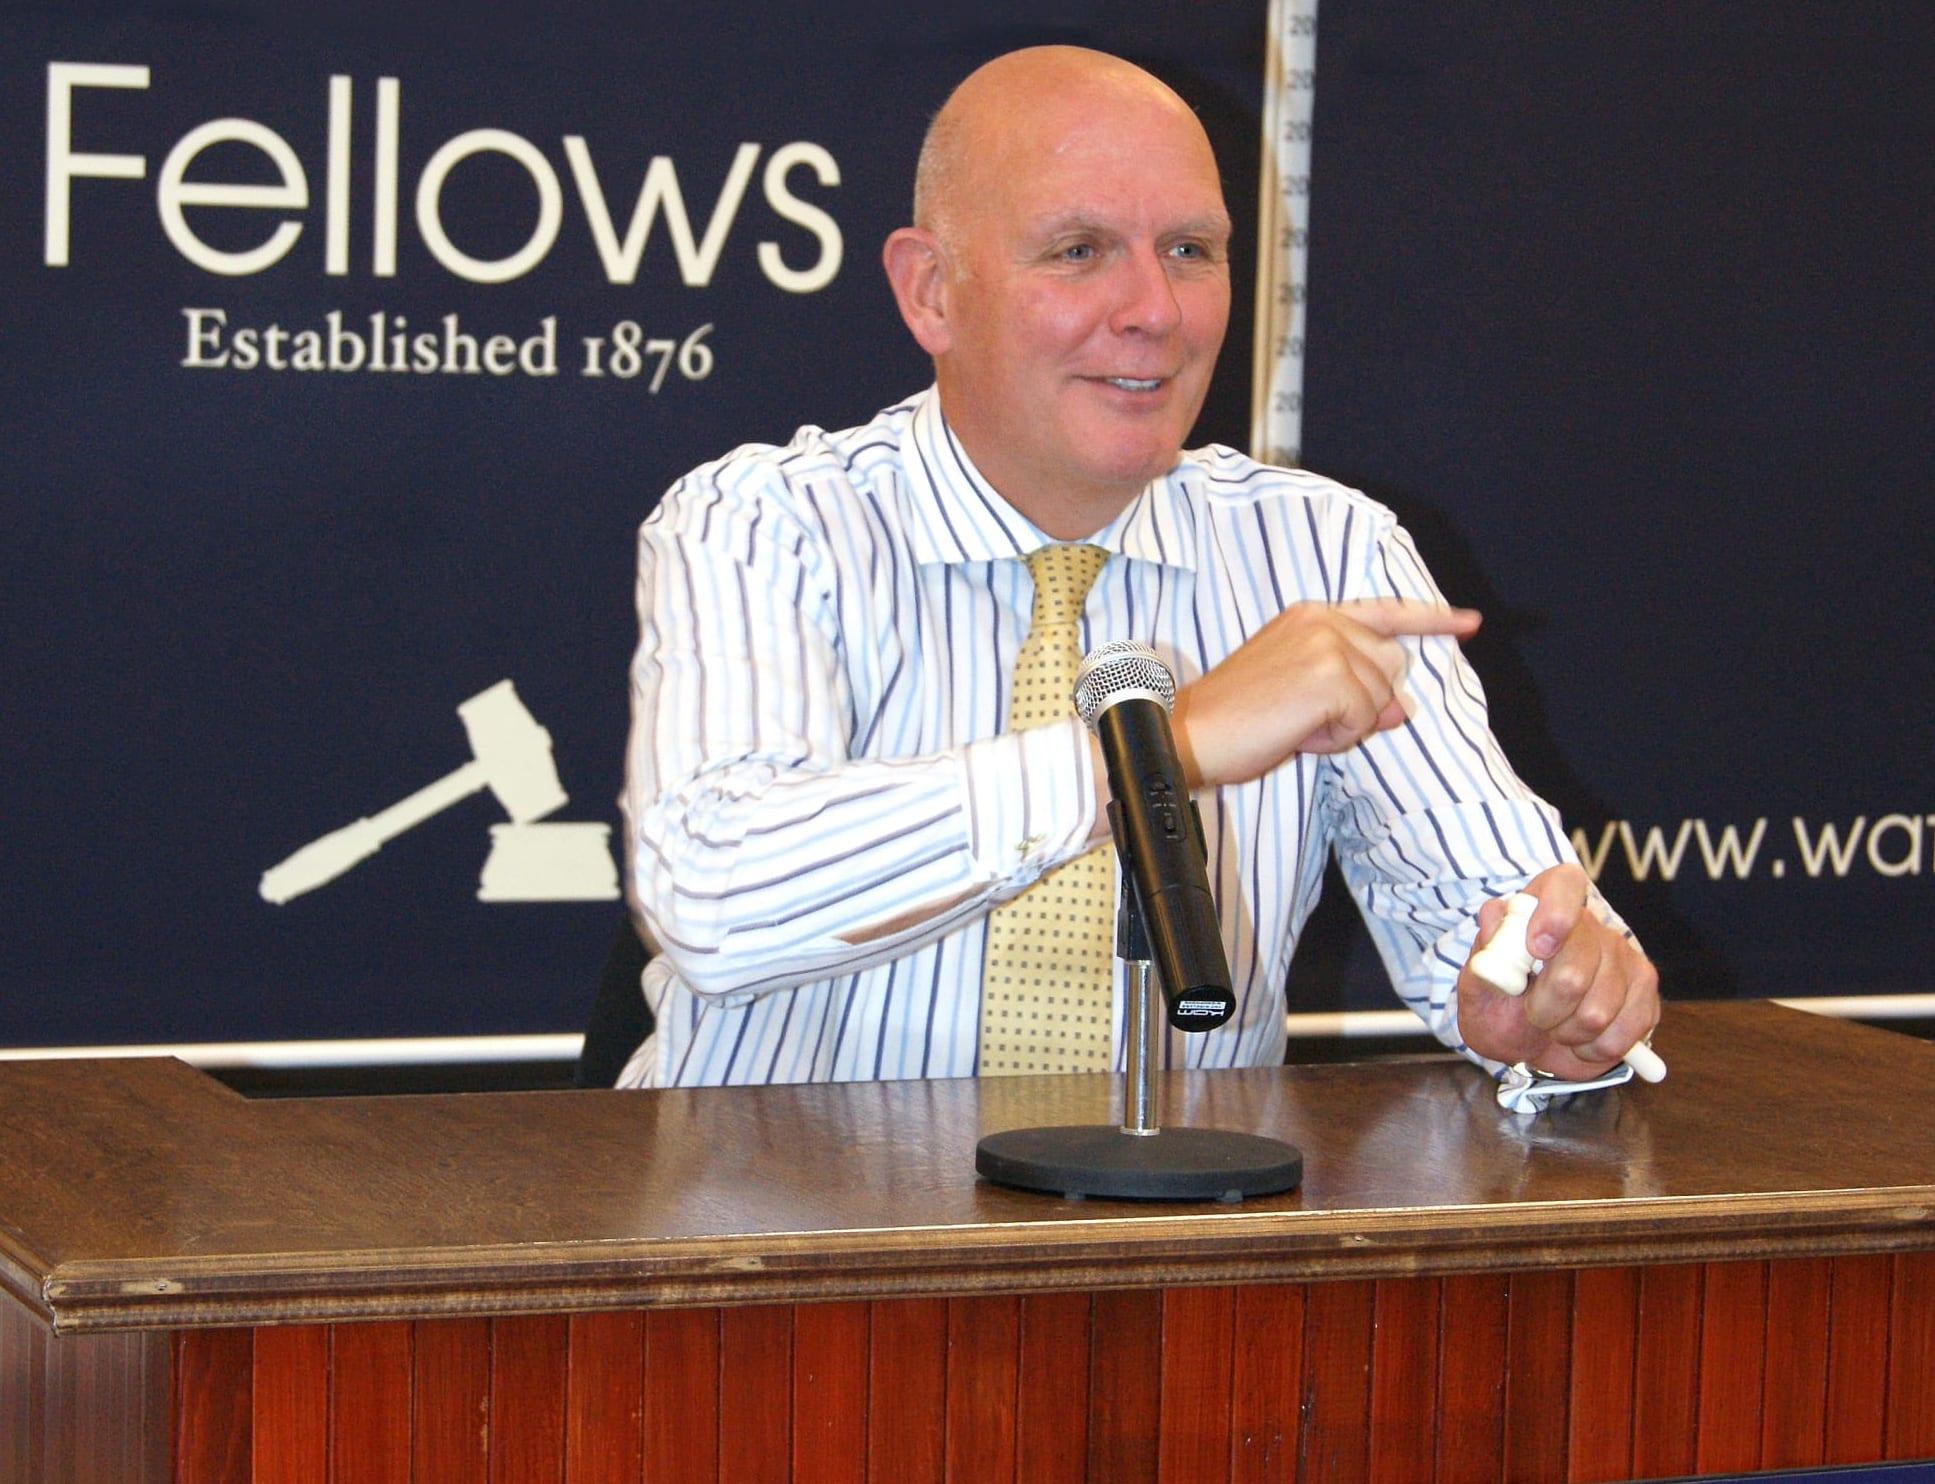 Fellows Auctioneers Ltd